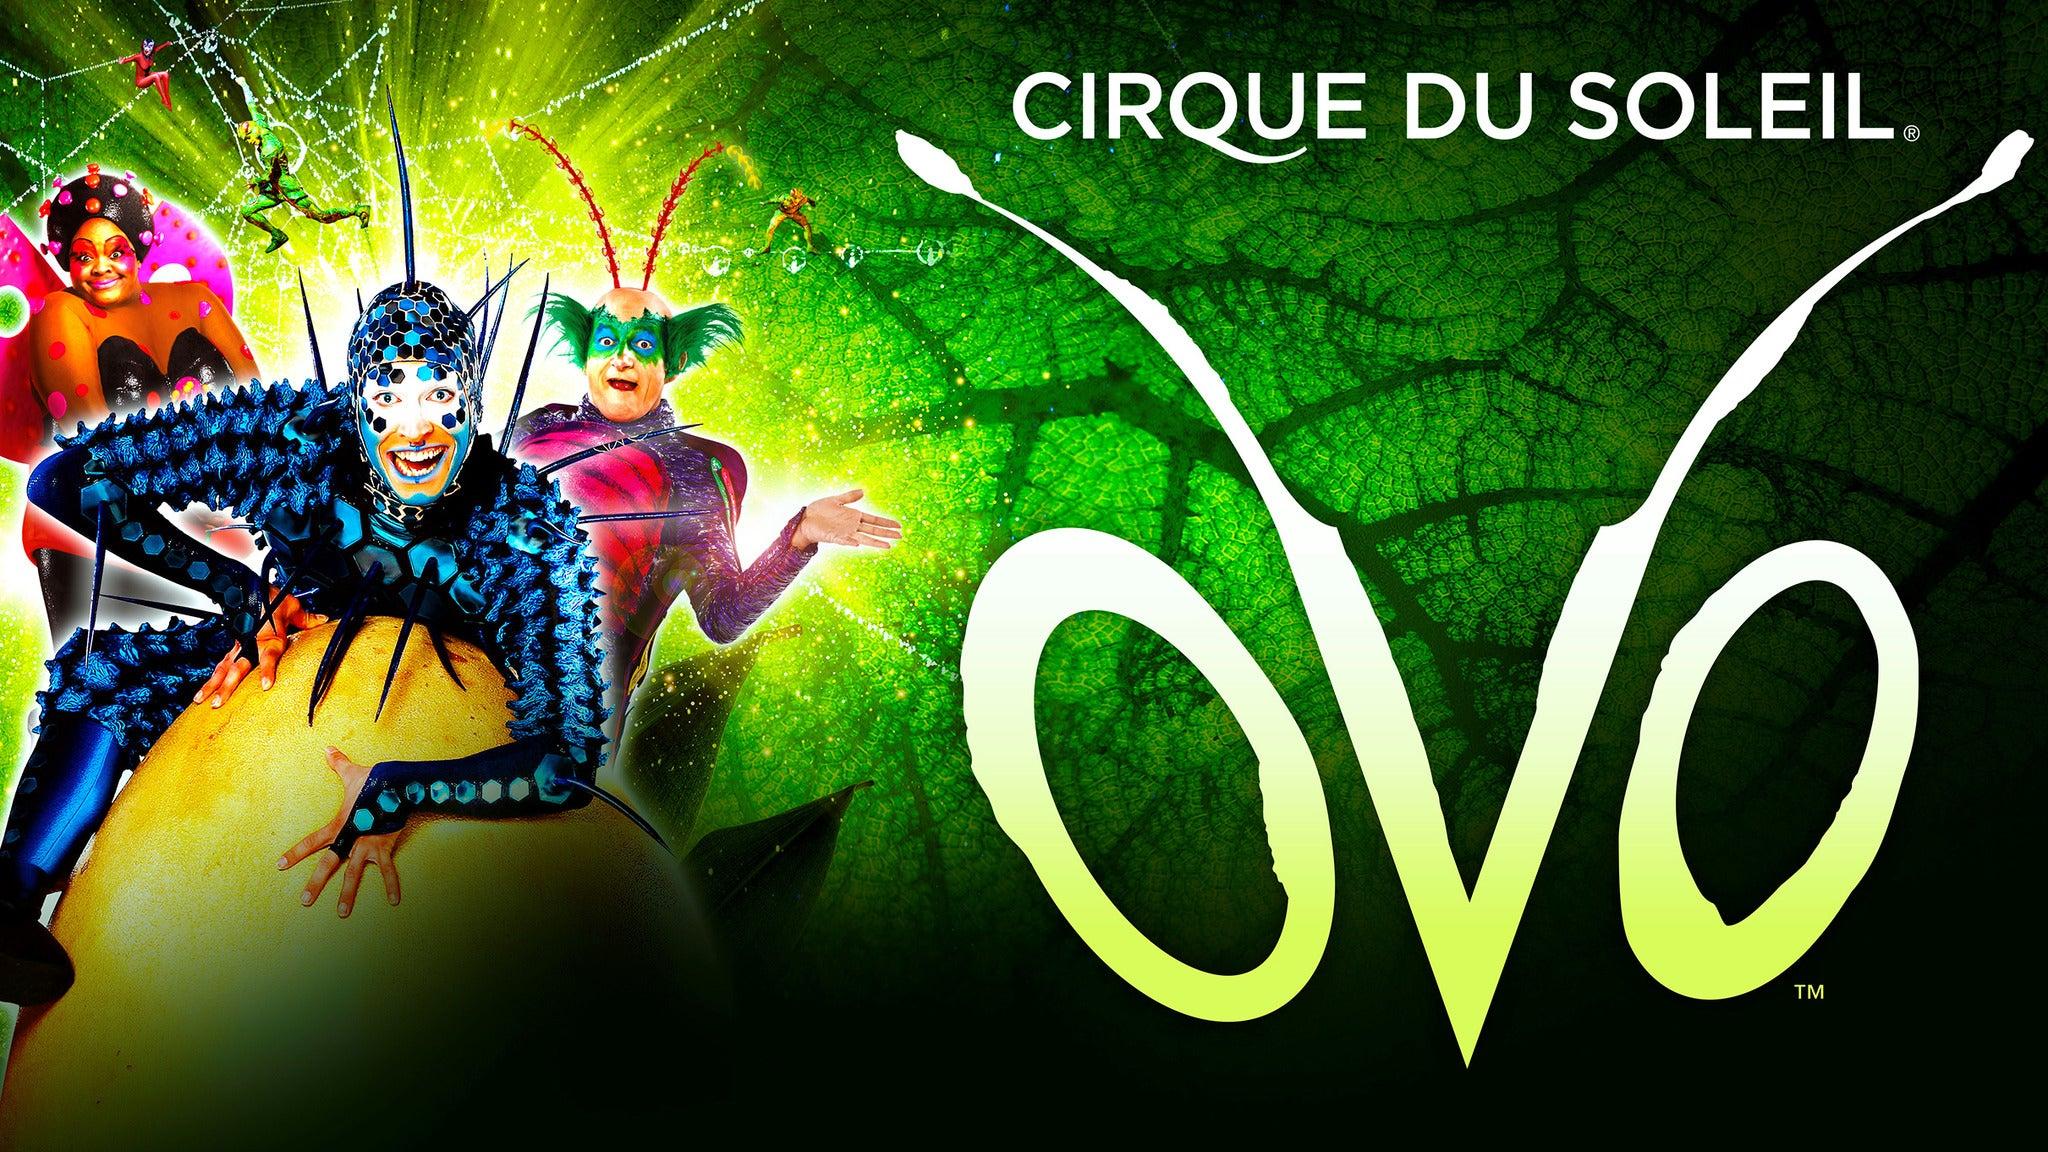 Cirque du Soleil: OVO at Don Haskins Center